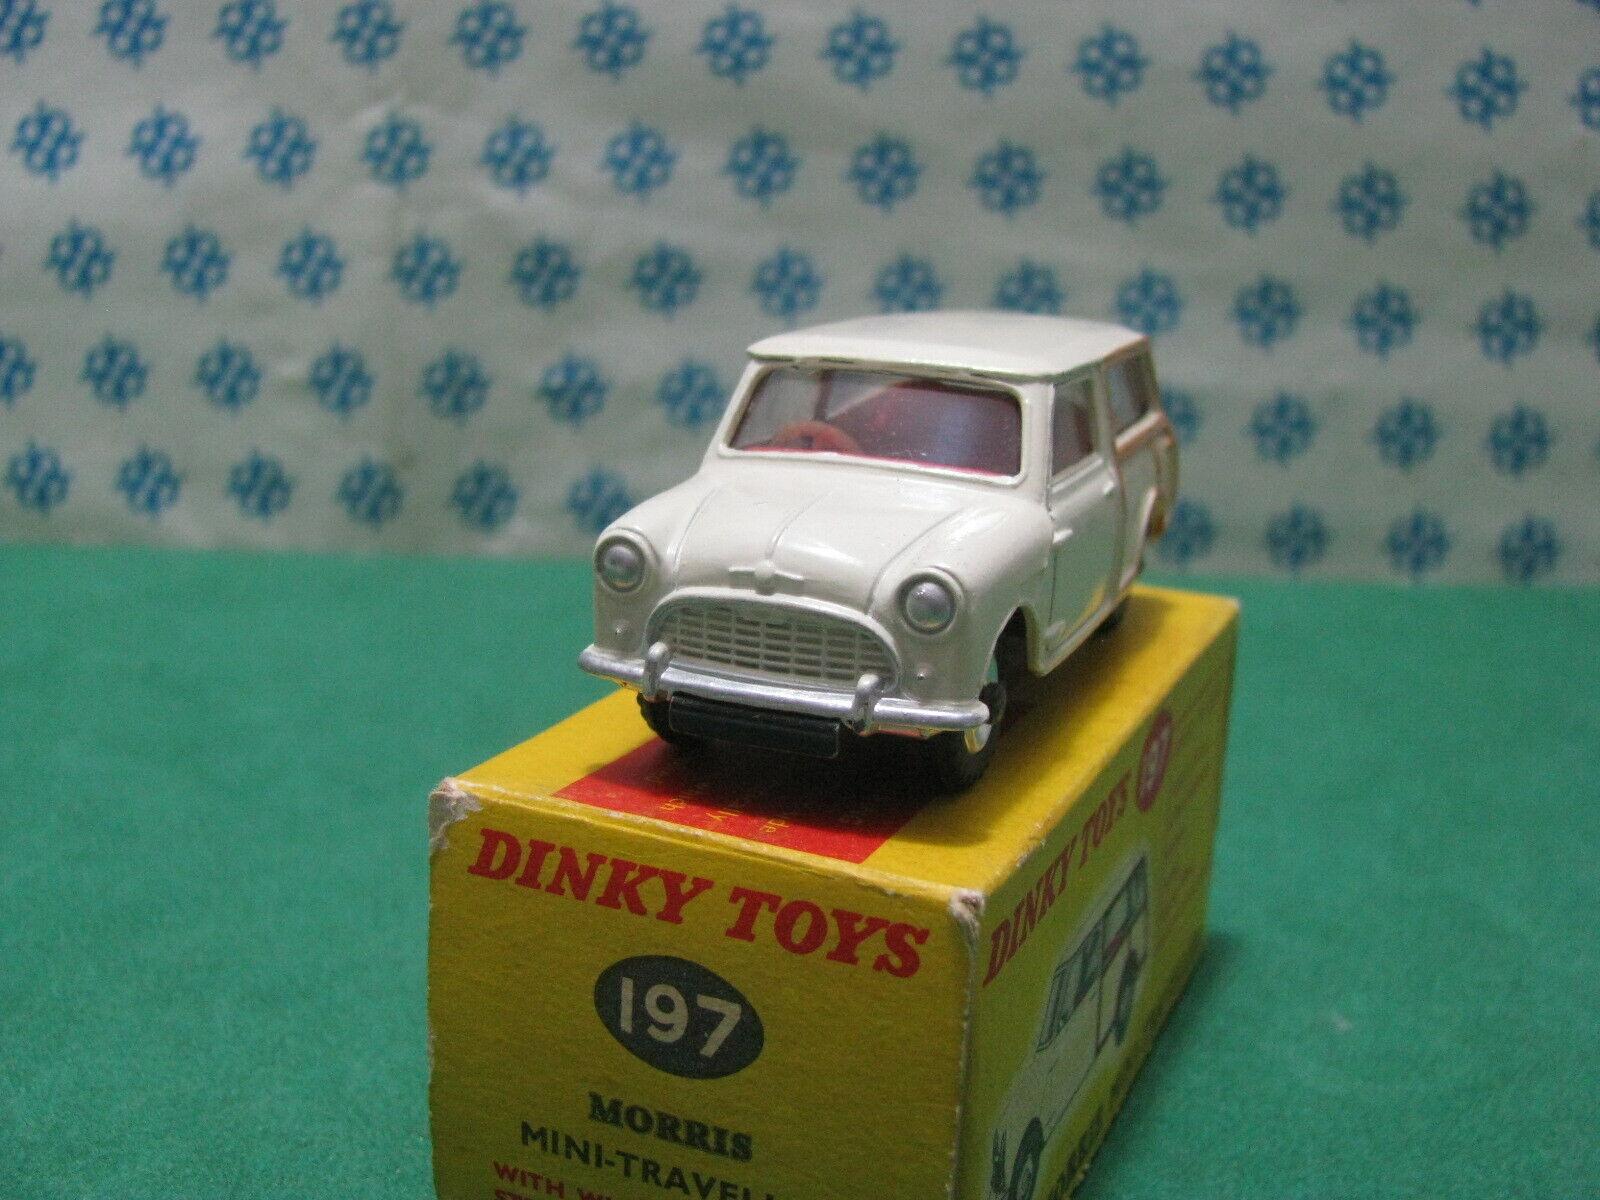 Vintage -  Mini Morris Traveller  - Dinky Toys 197  Nuova - Mint in Box